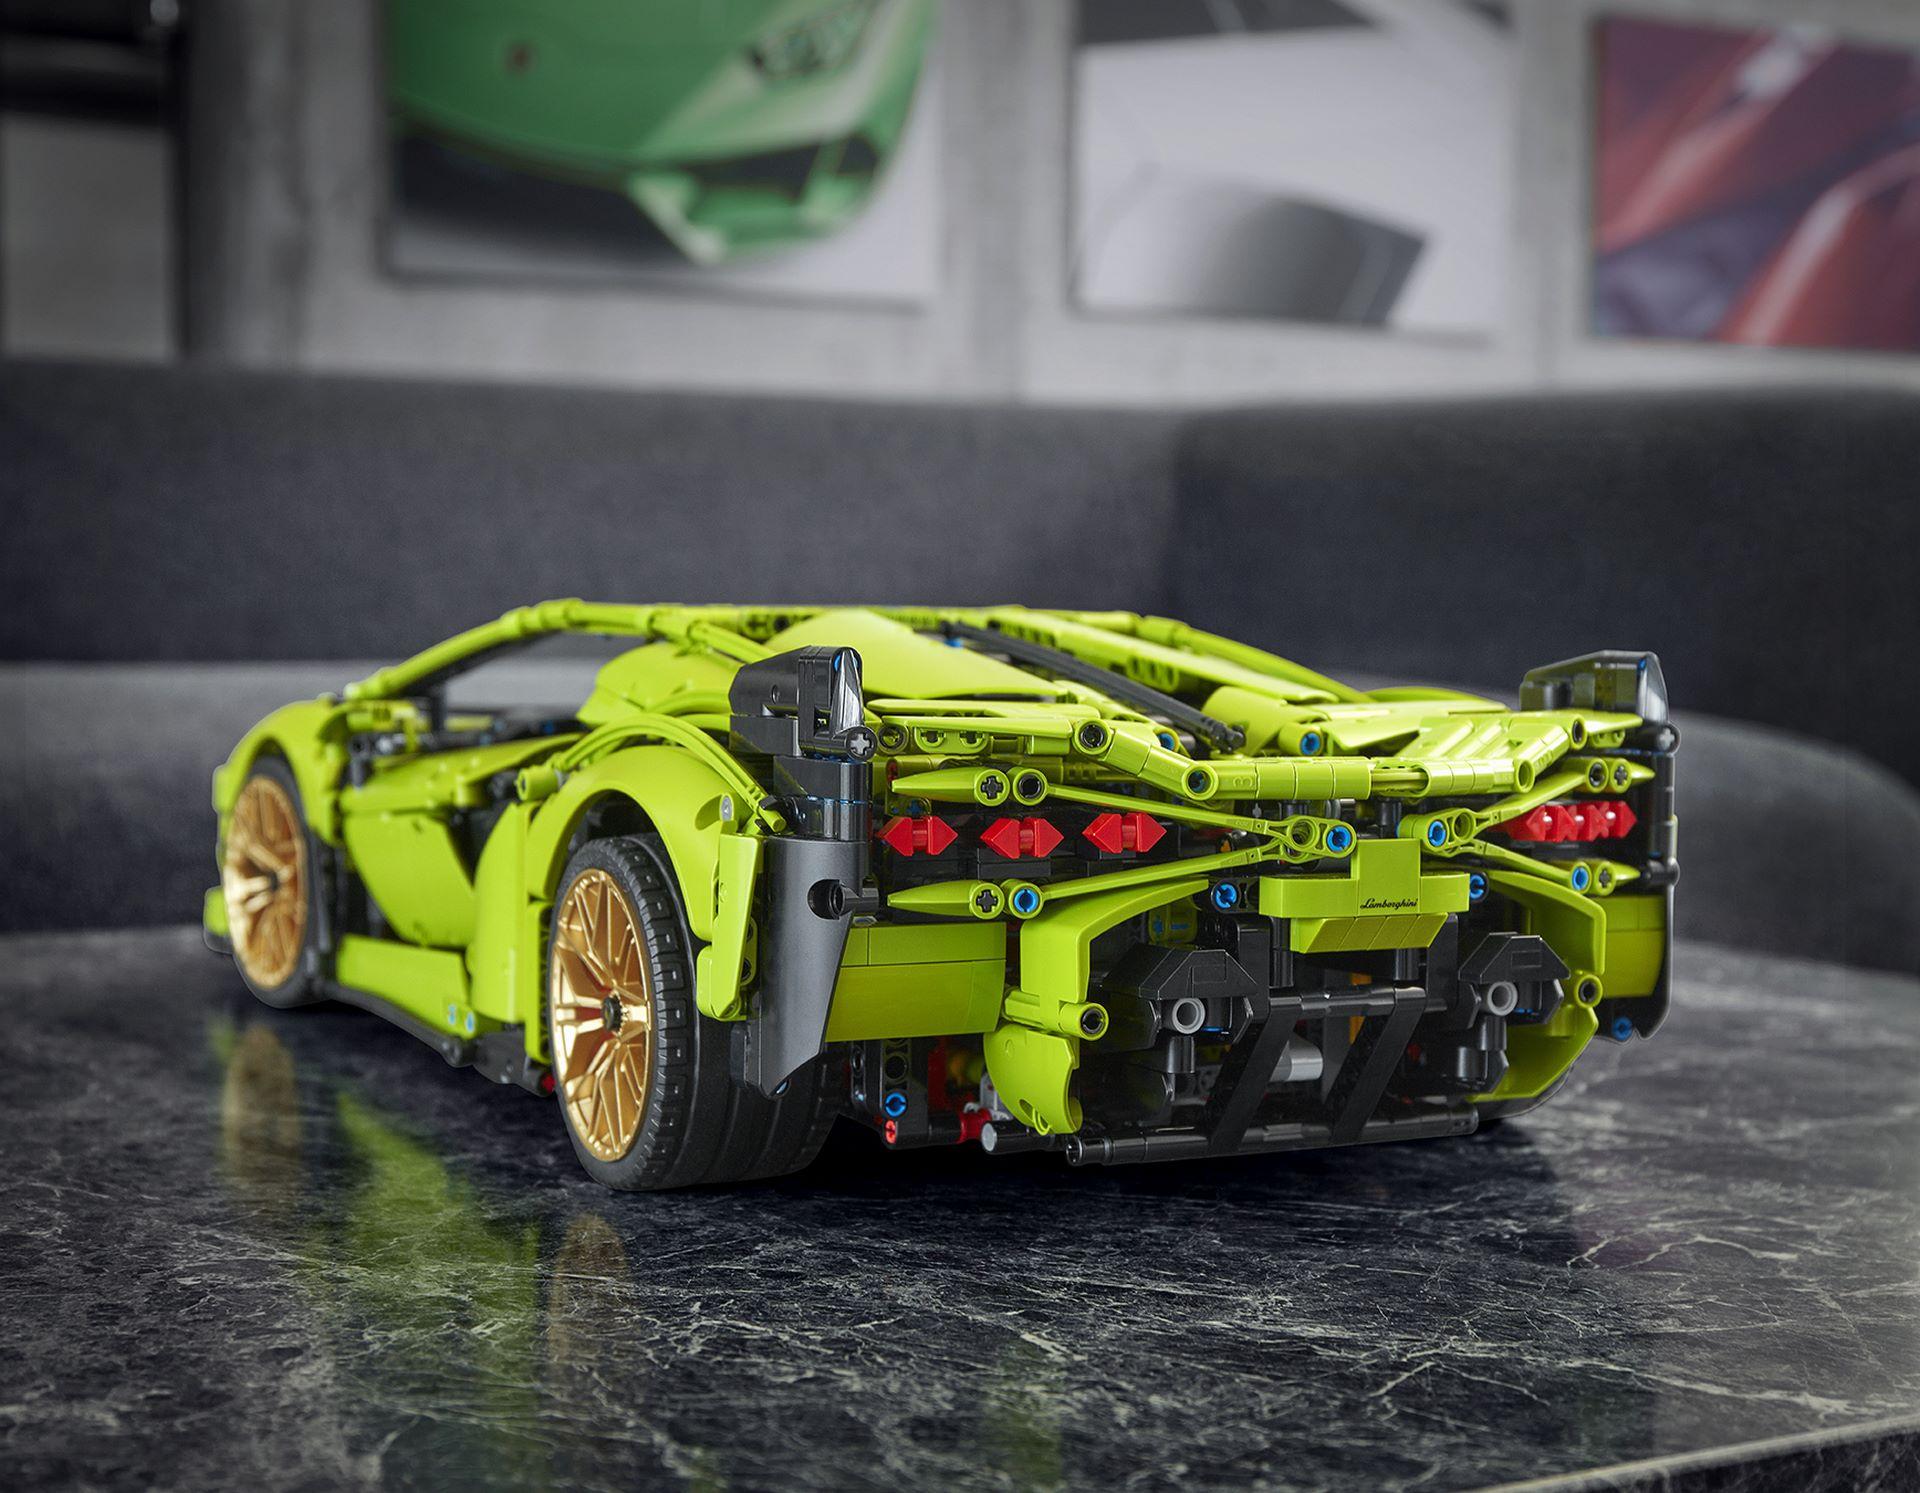 Lamborghini-Sian-FKP-37-Lego-Technic-1